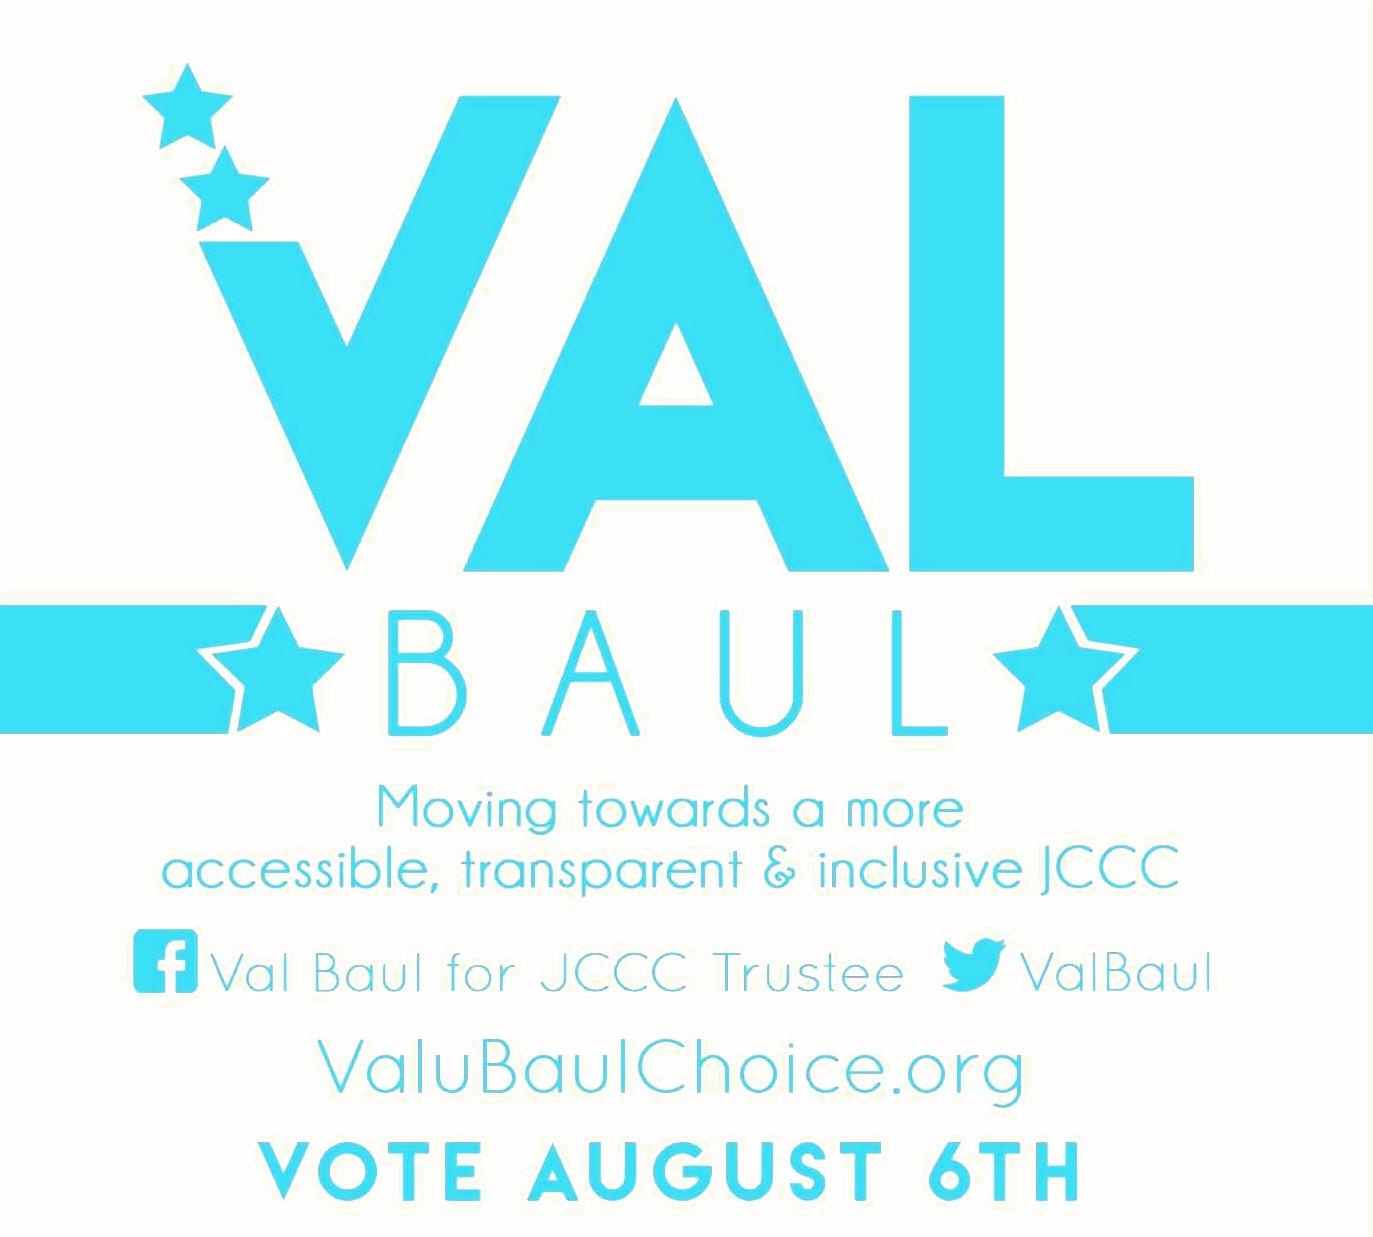 Val Baul